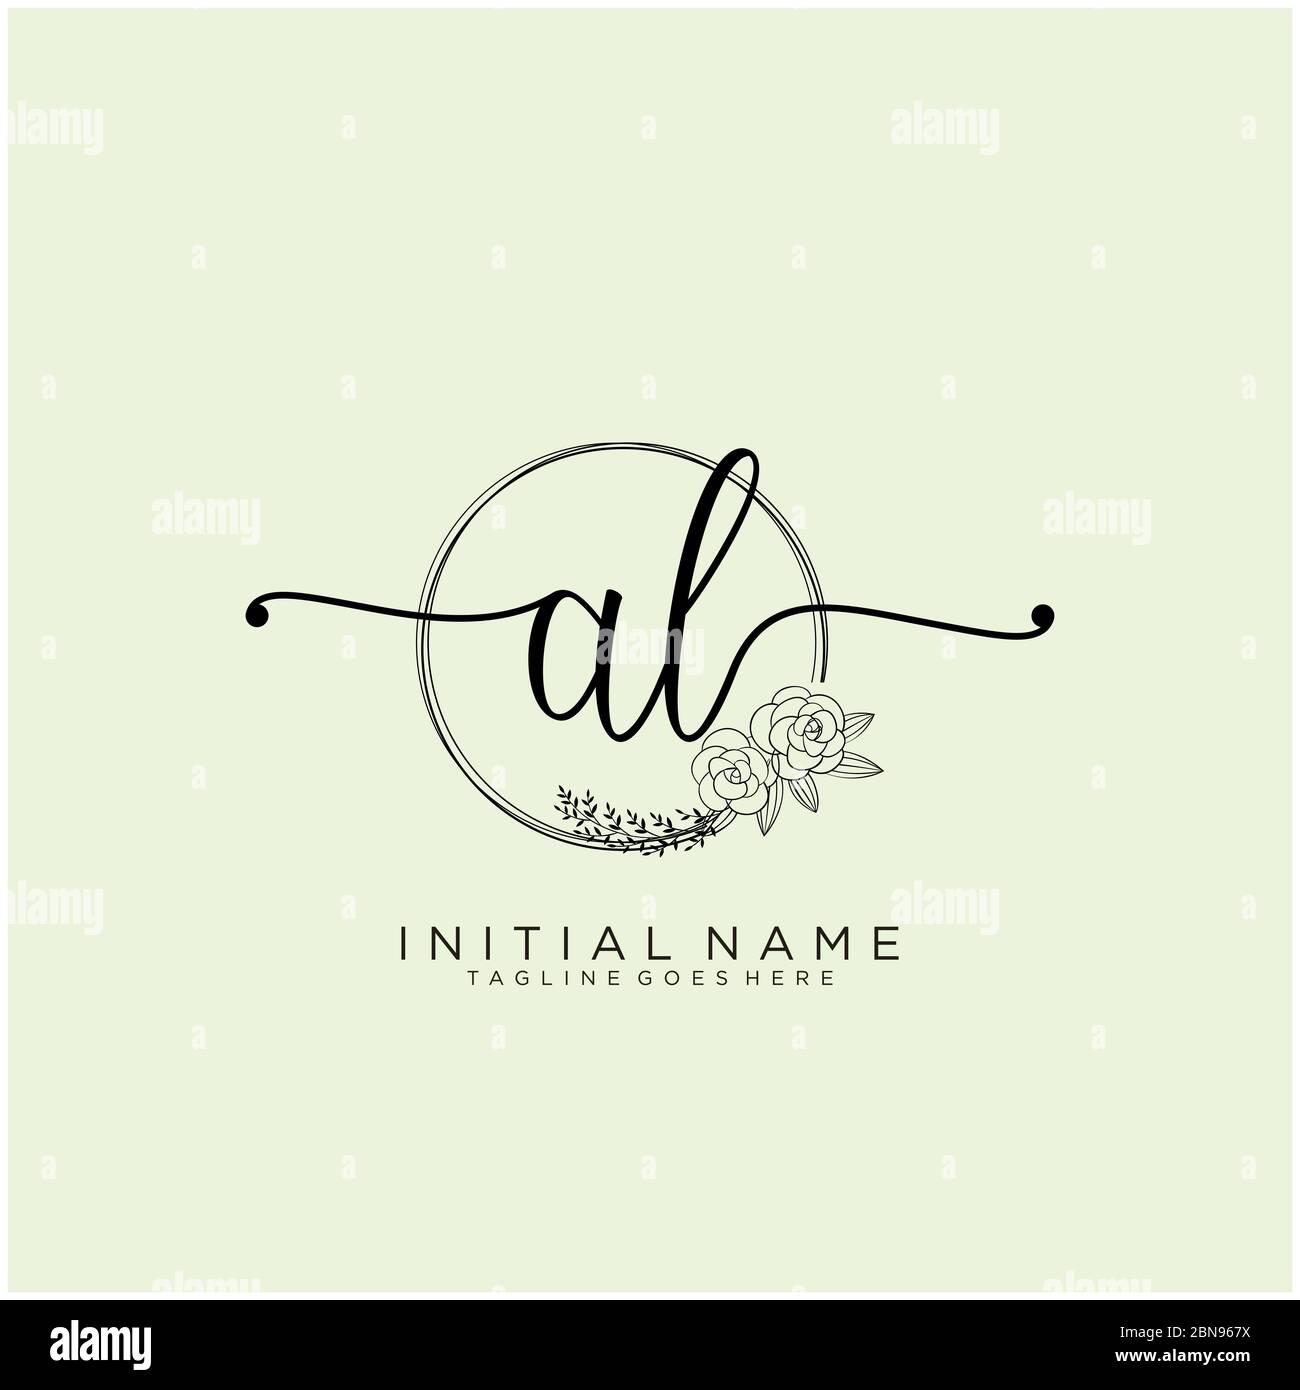 Initial Al Beauty Monogram And Elegant Logo Design Stock Vector Image Art Alamy